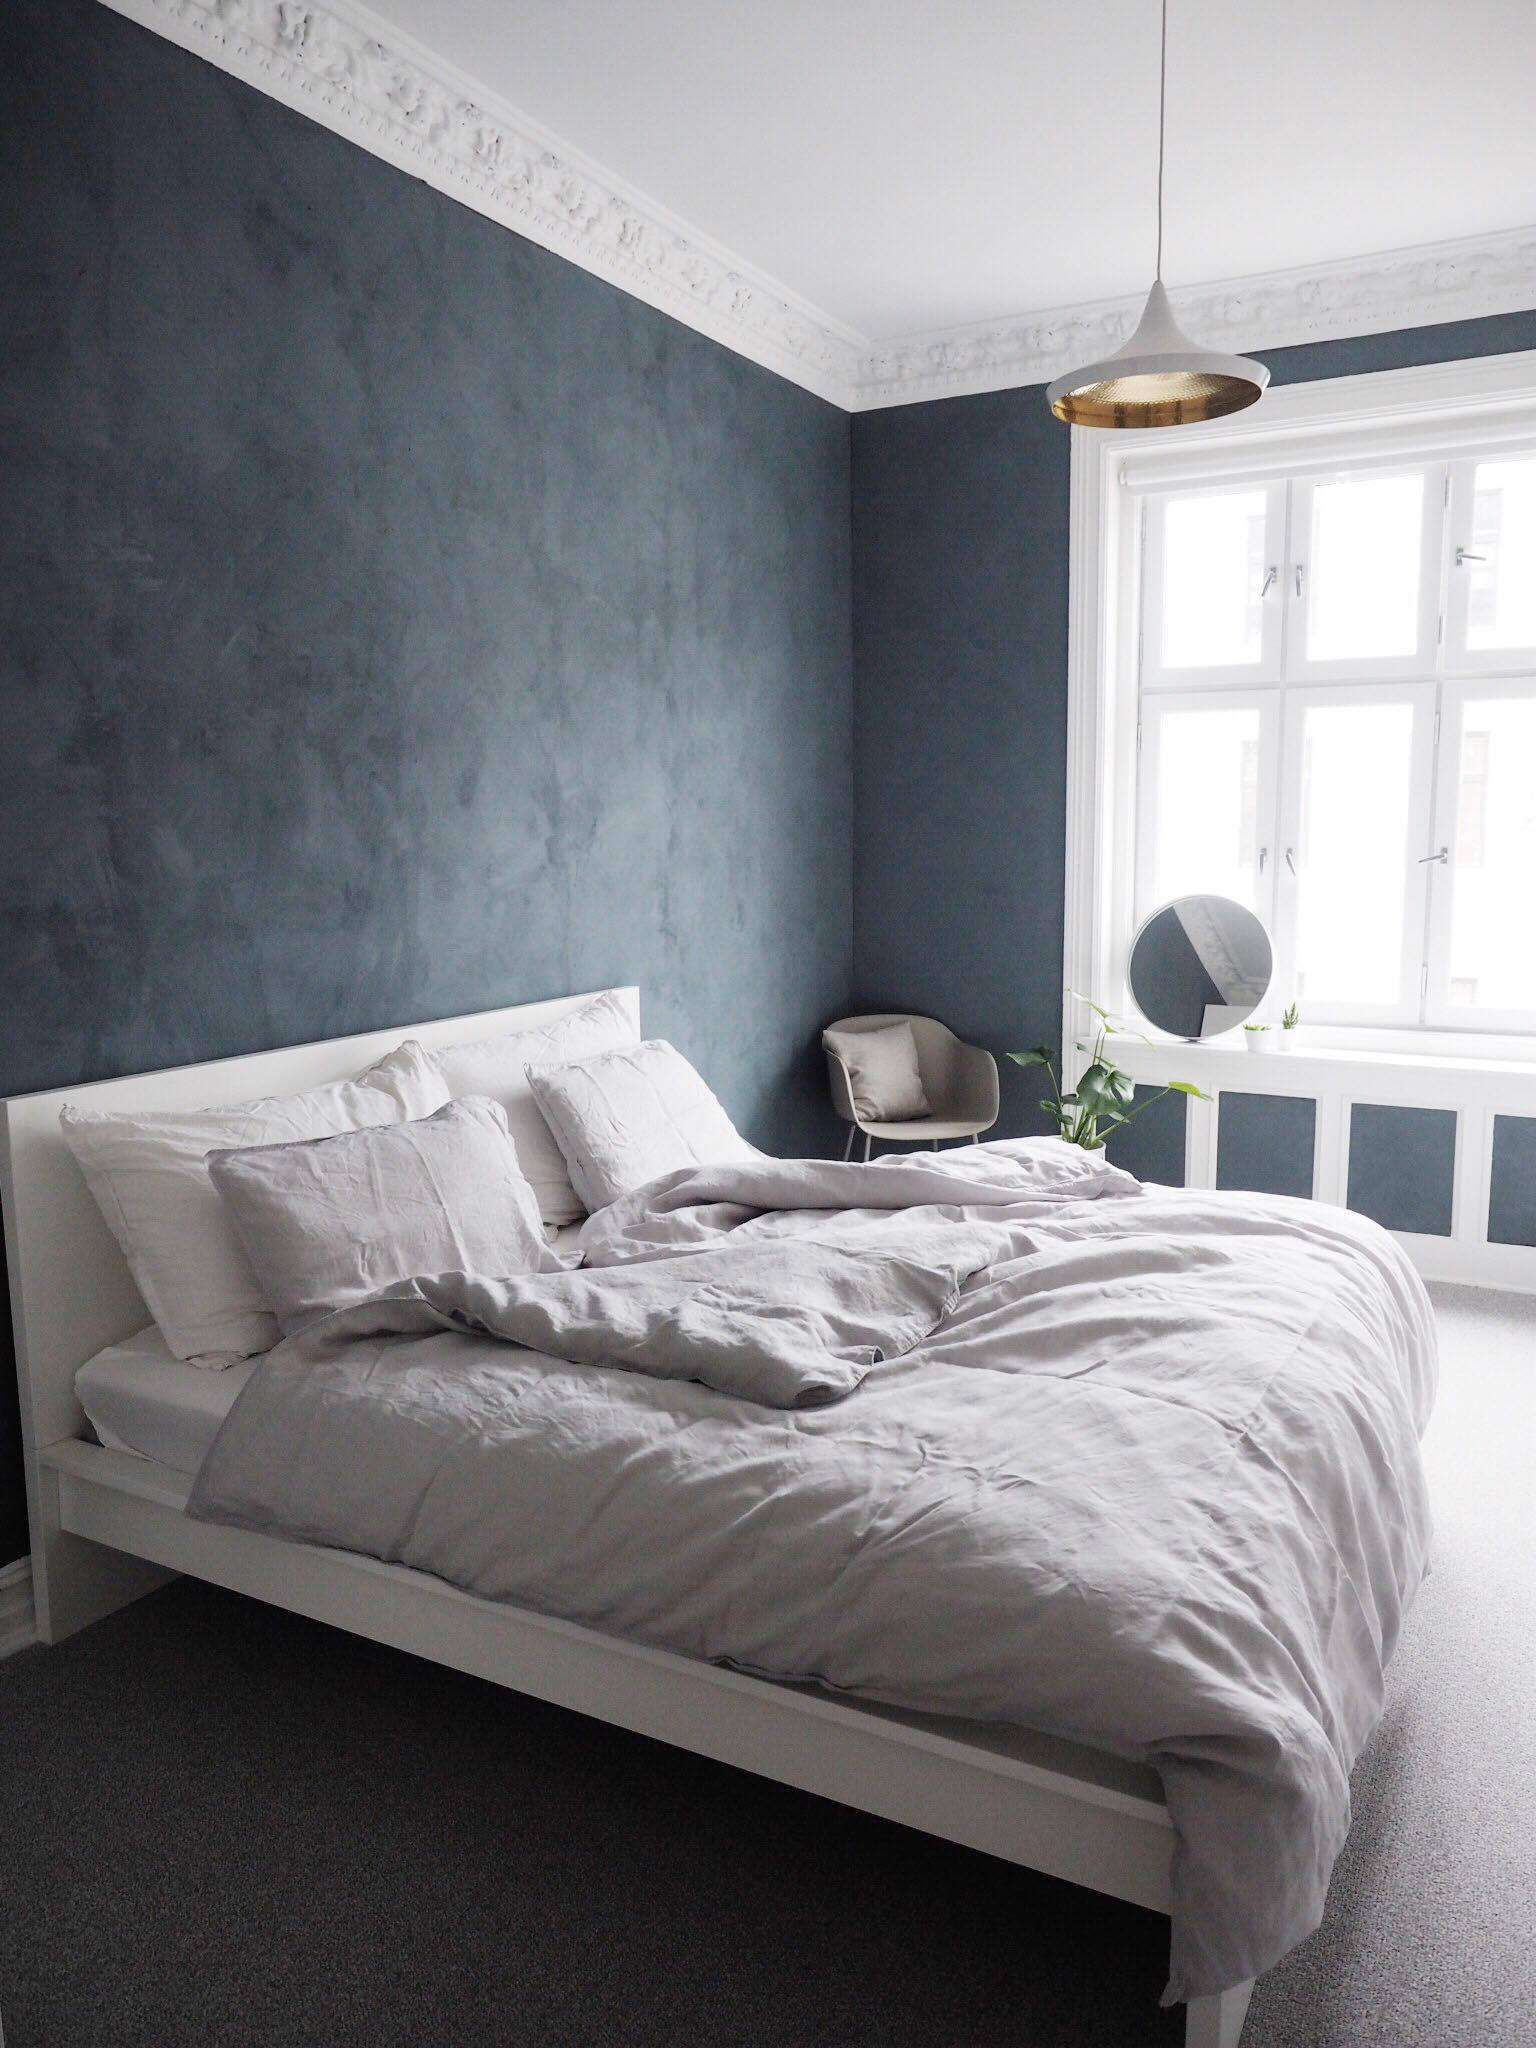 My Bedroom Seng Ikea Sengetoy H M Home Stol Muuto Speil Hay Blomsterkrukke Menu Lampe Tom Sovevaerelsesideer Sovevaerelsesdesign Flotte Sovevaerelser